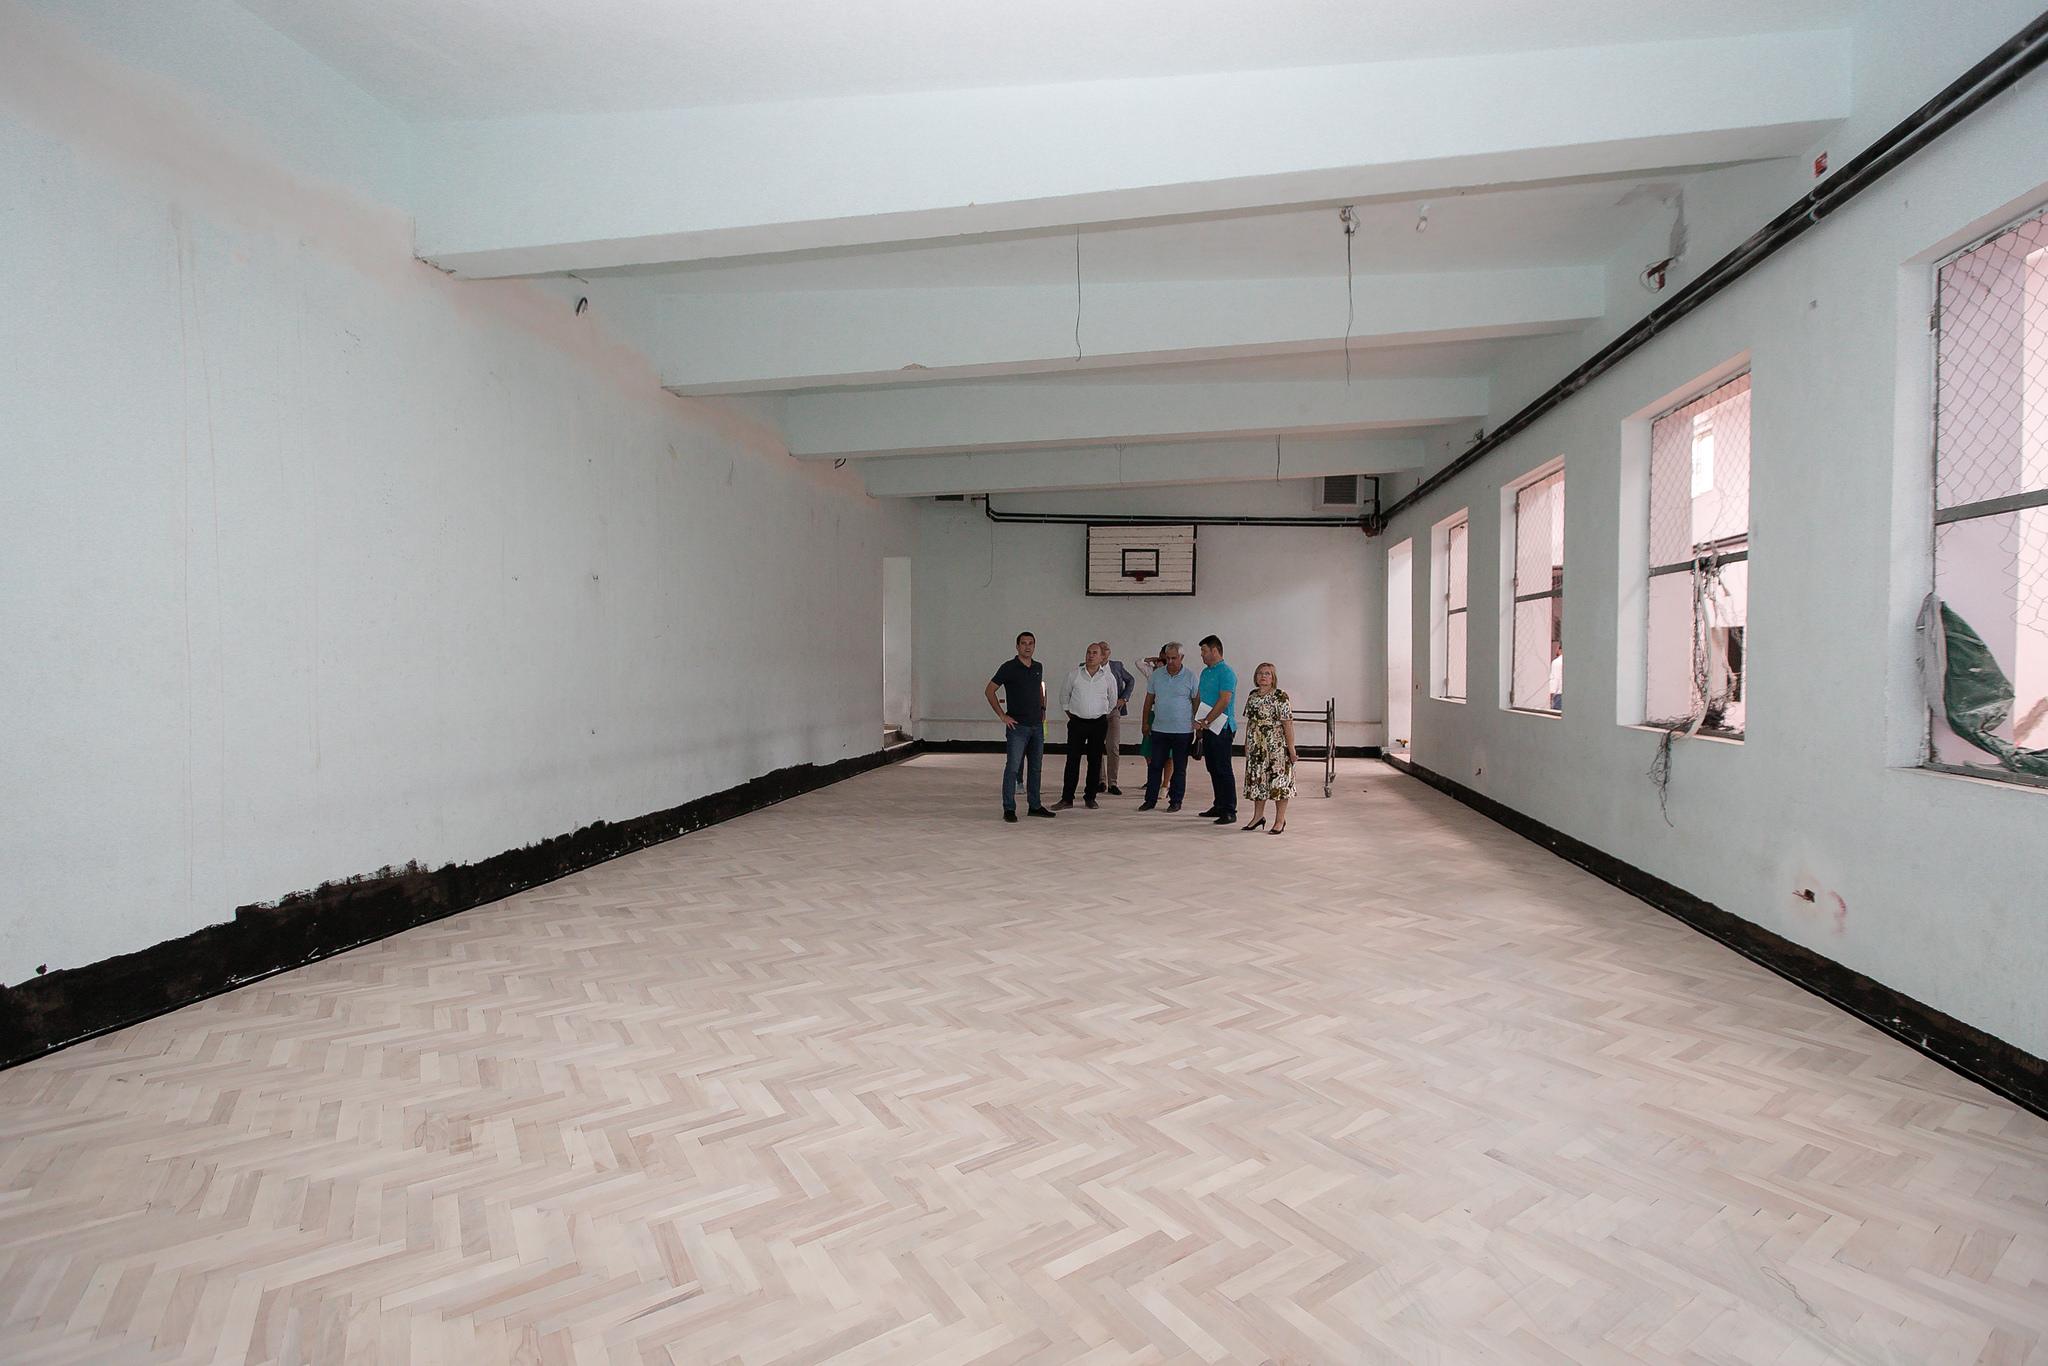 Veliaj gjate inspektimit te rikonstruksionit te shkolles Ismail Qemali (3)